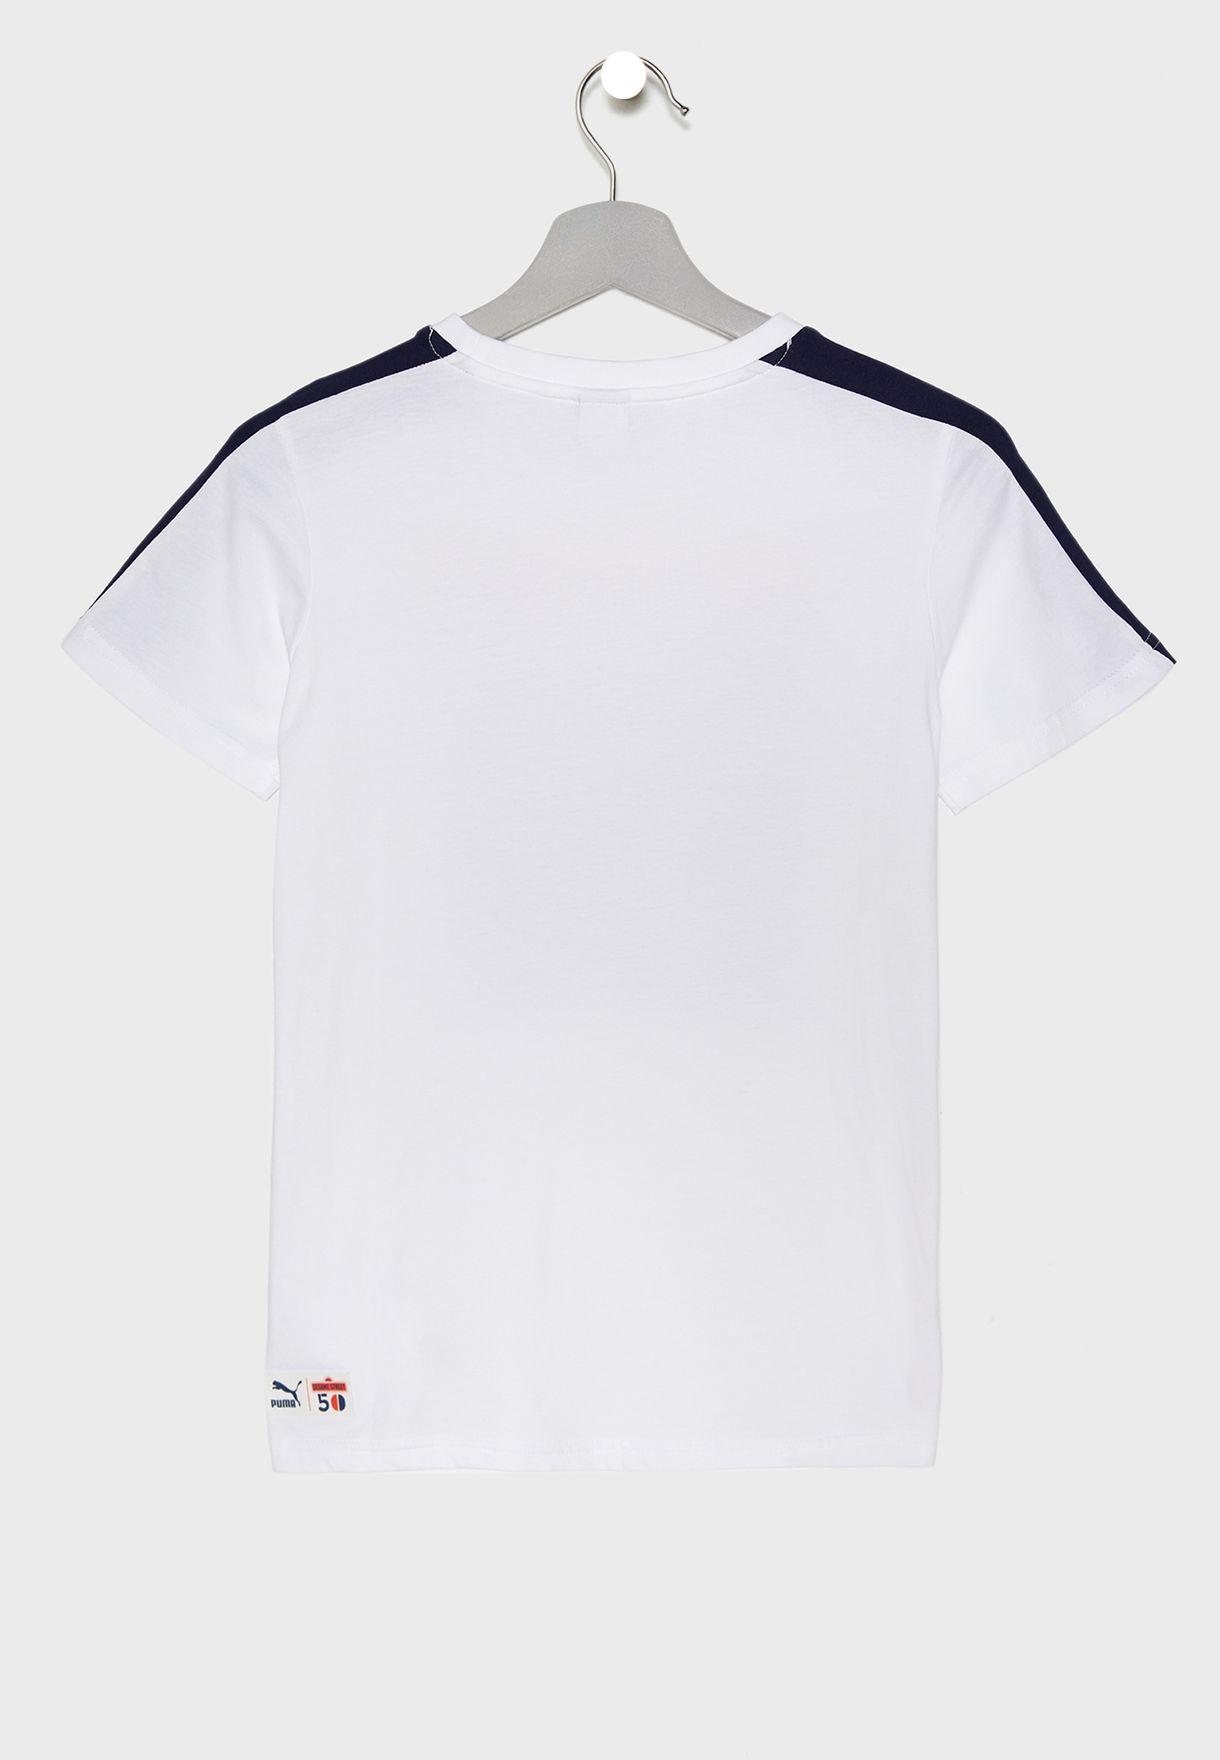 d5954a435ff4 Shop PUMA white Kids Sesame Street T-Shirt 85447602 for Kids in ...